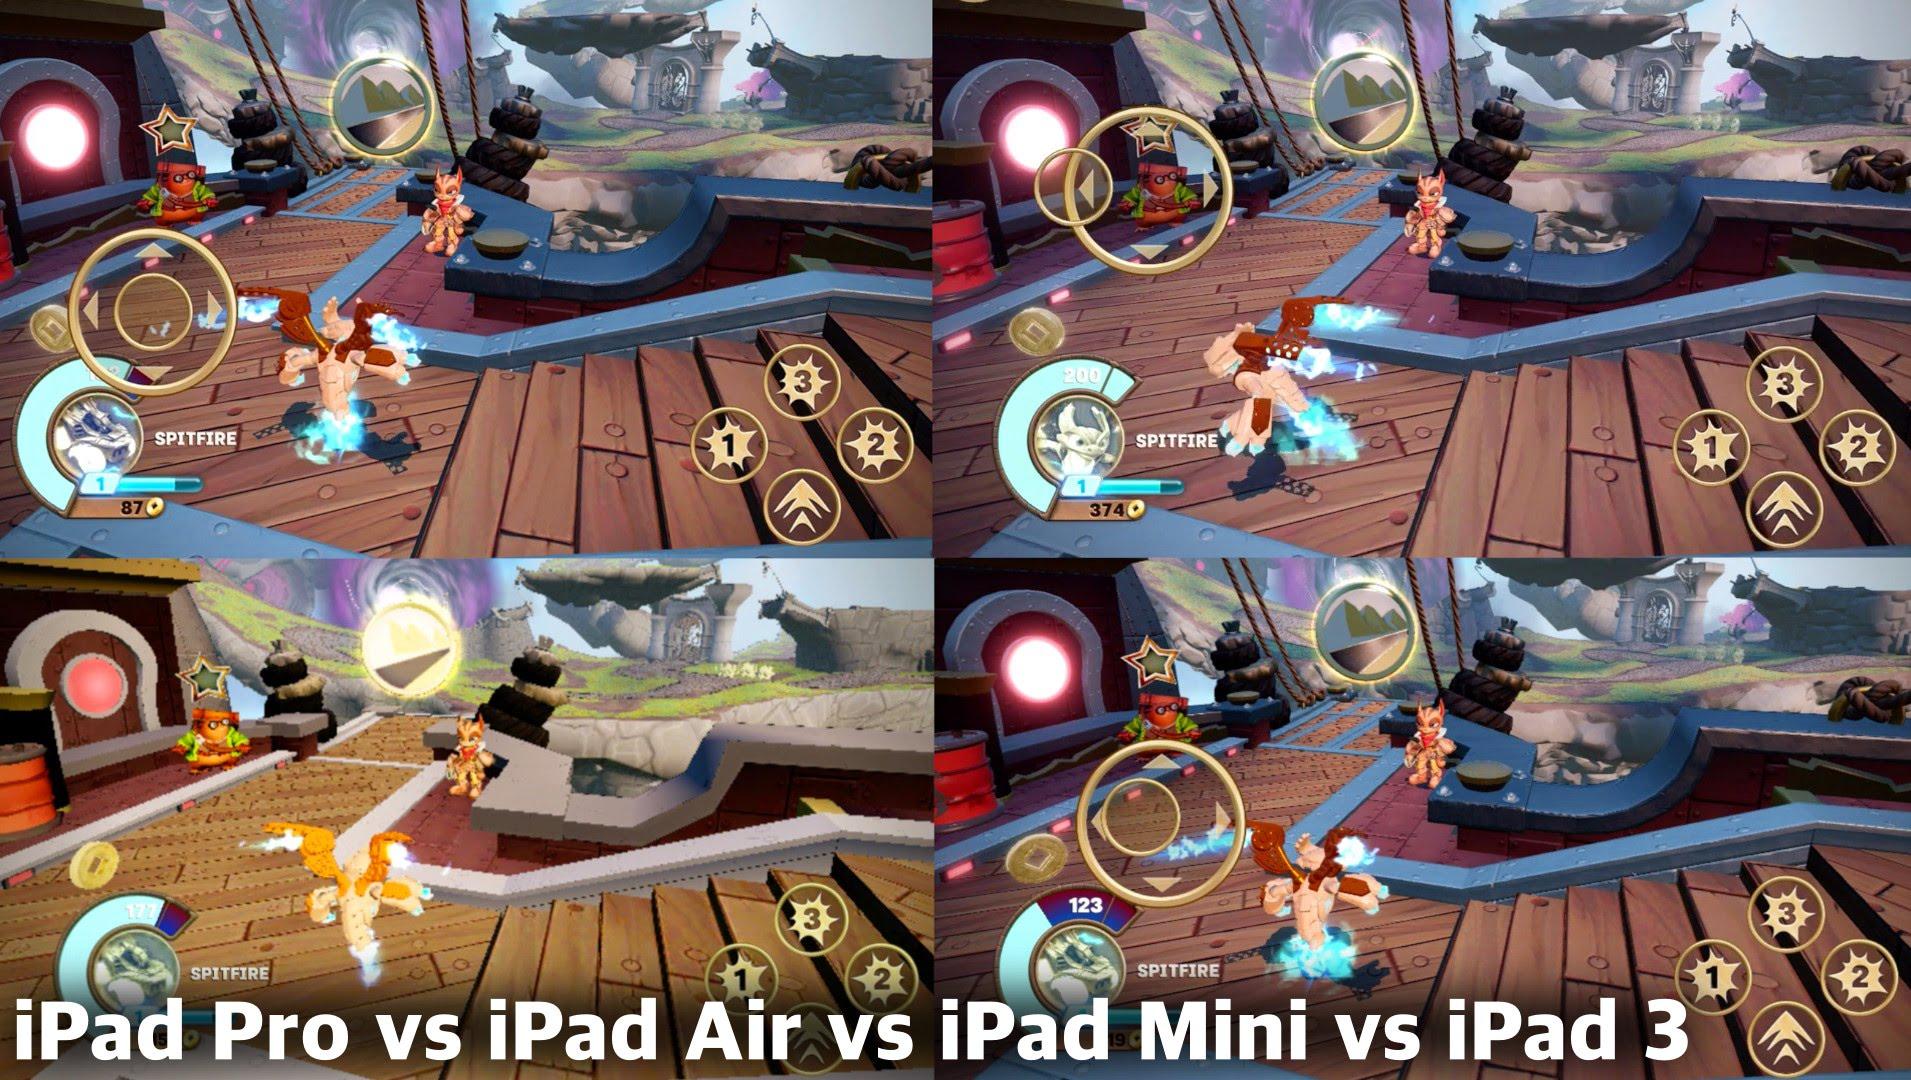 Skylanders iOS Comparison – iPad Pro vs iPad Air 2 vs iPad Mini 2 vs iPad 3